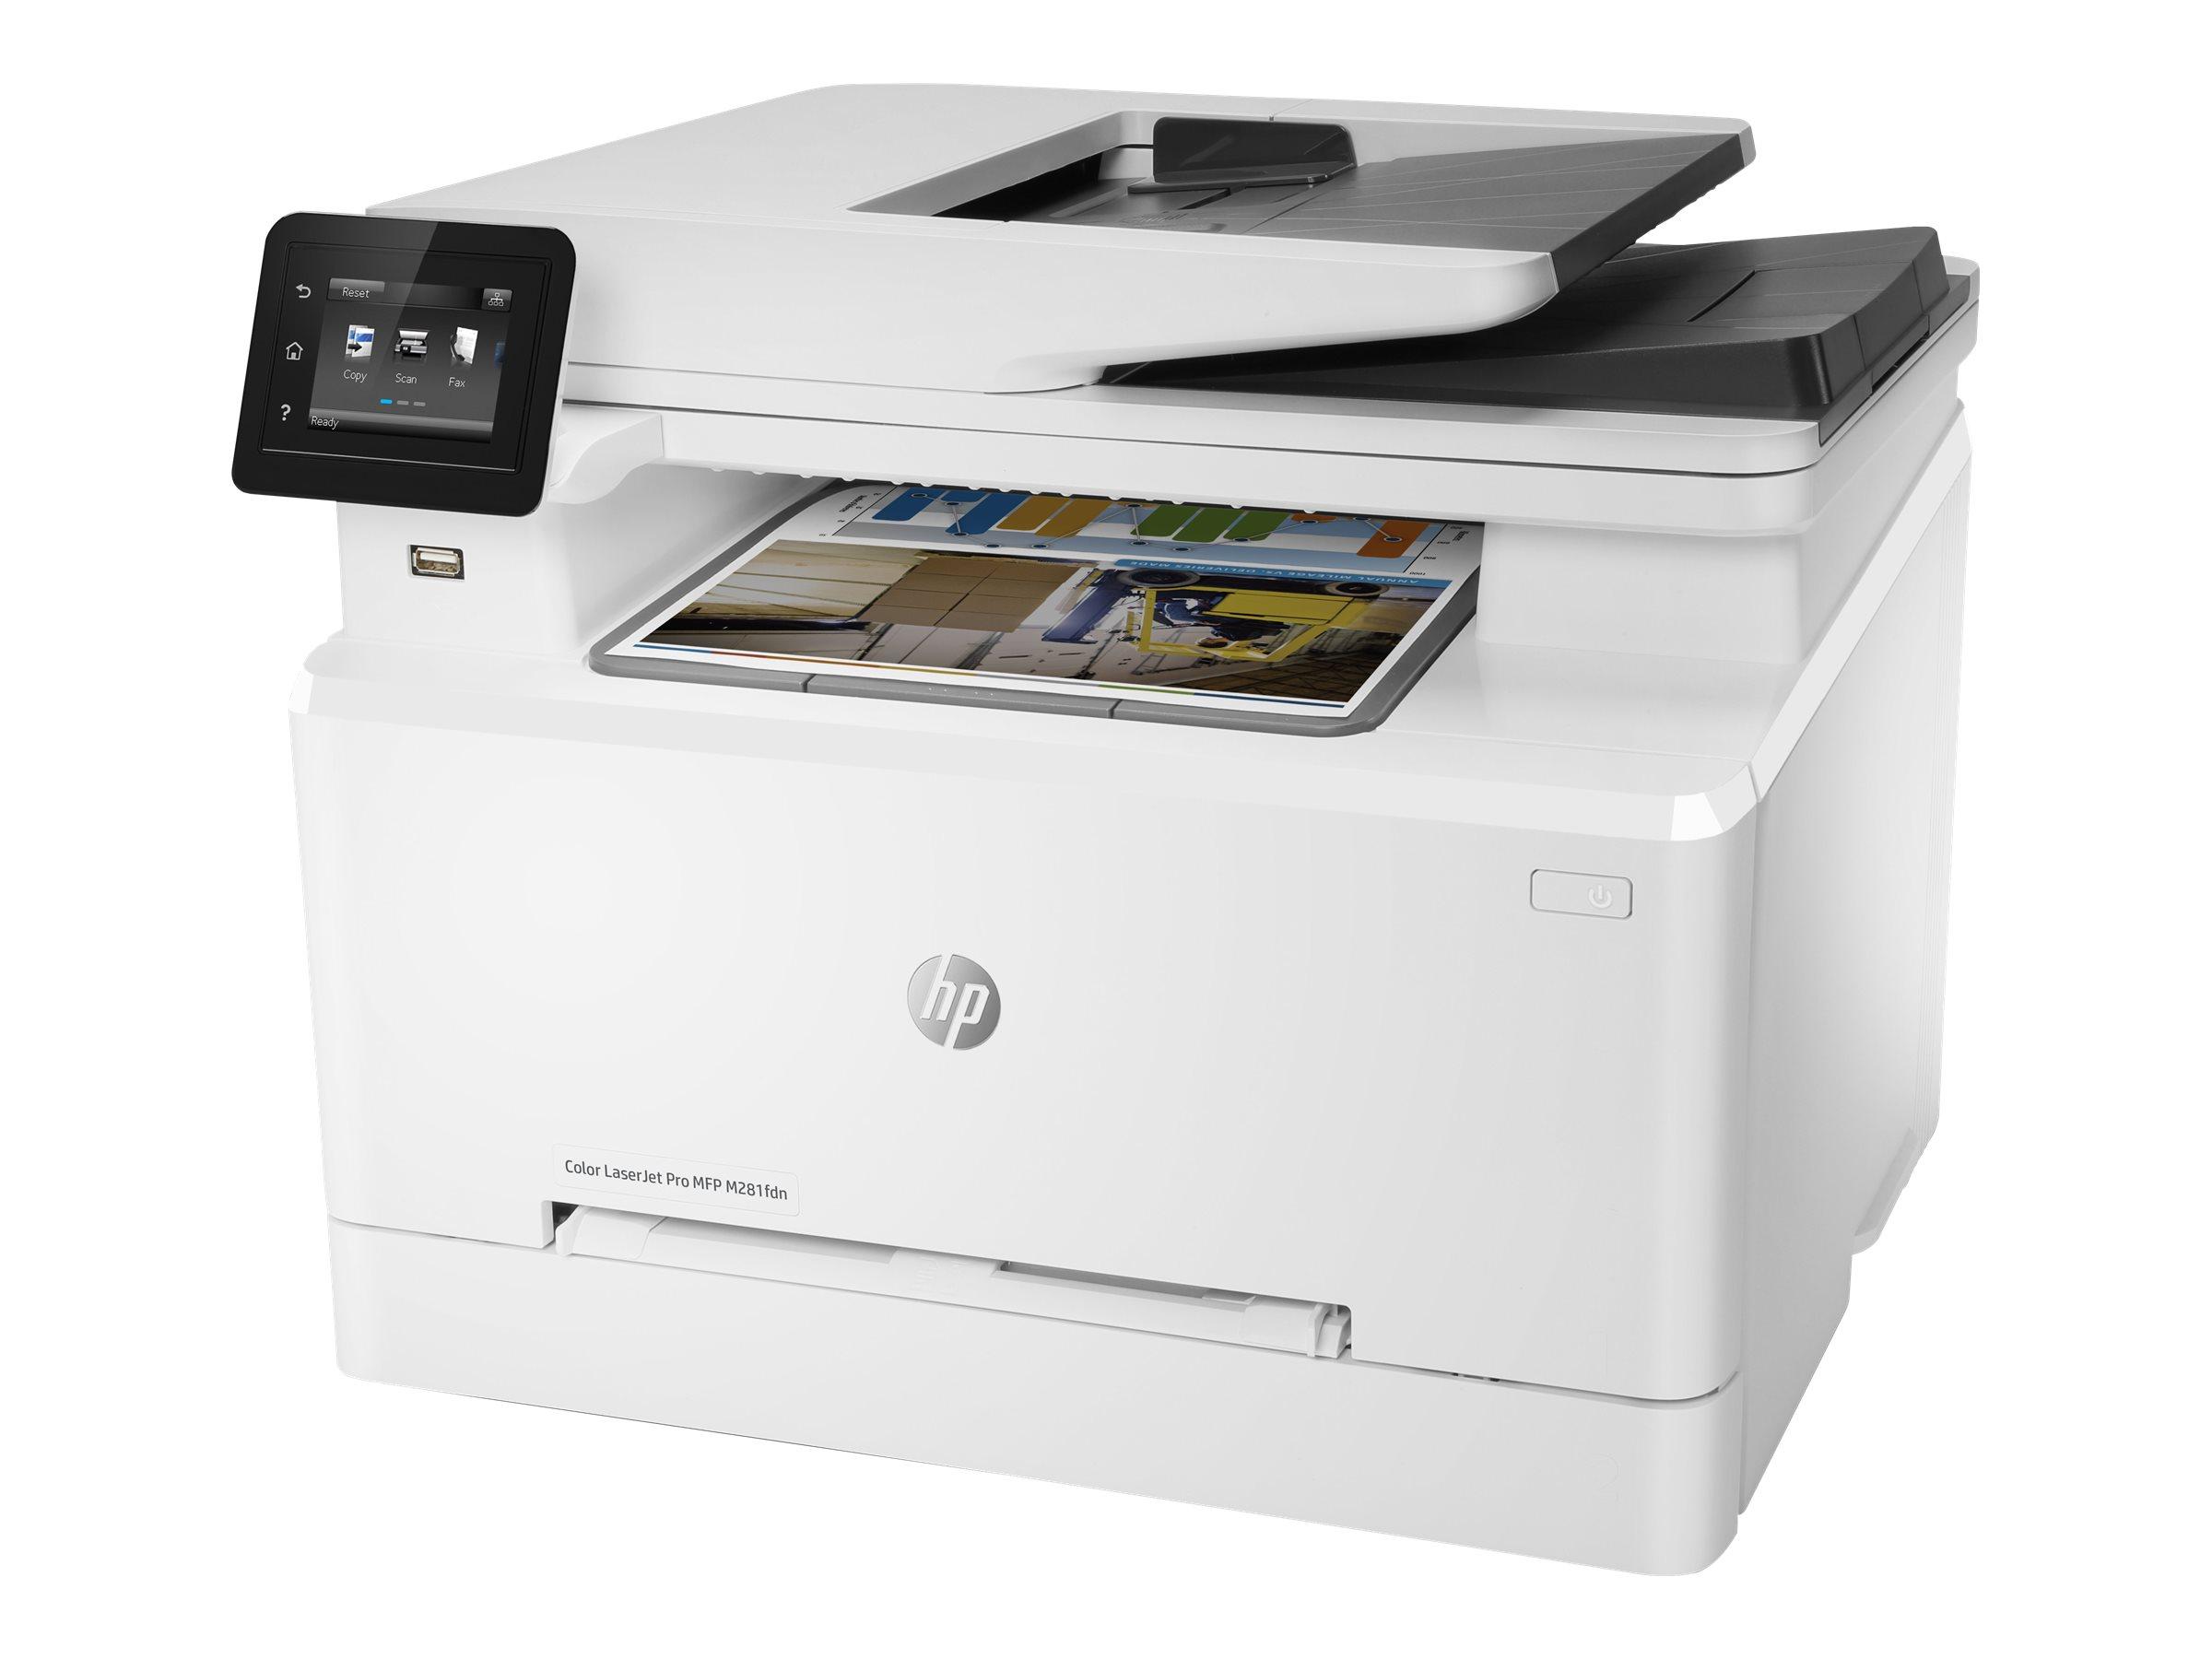 HP Color LaserJet Pro MFP M281fdn - Multifunktionsdrucker - Farbe - Laser - Legal (216 x 356 mm) (Original) - A4/Legal (Medien)